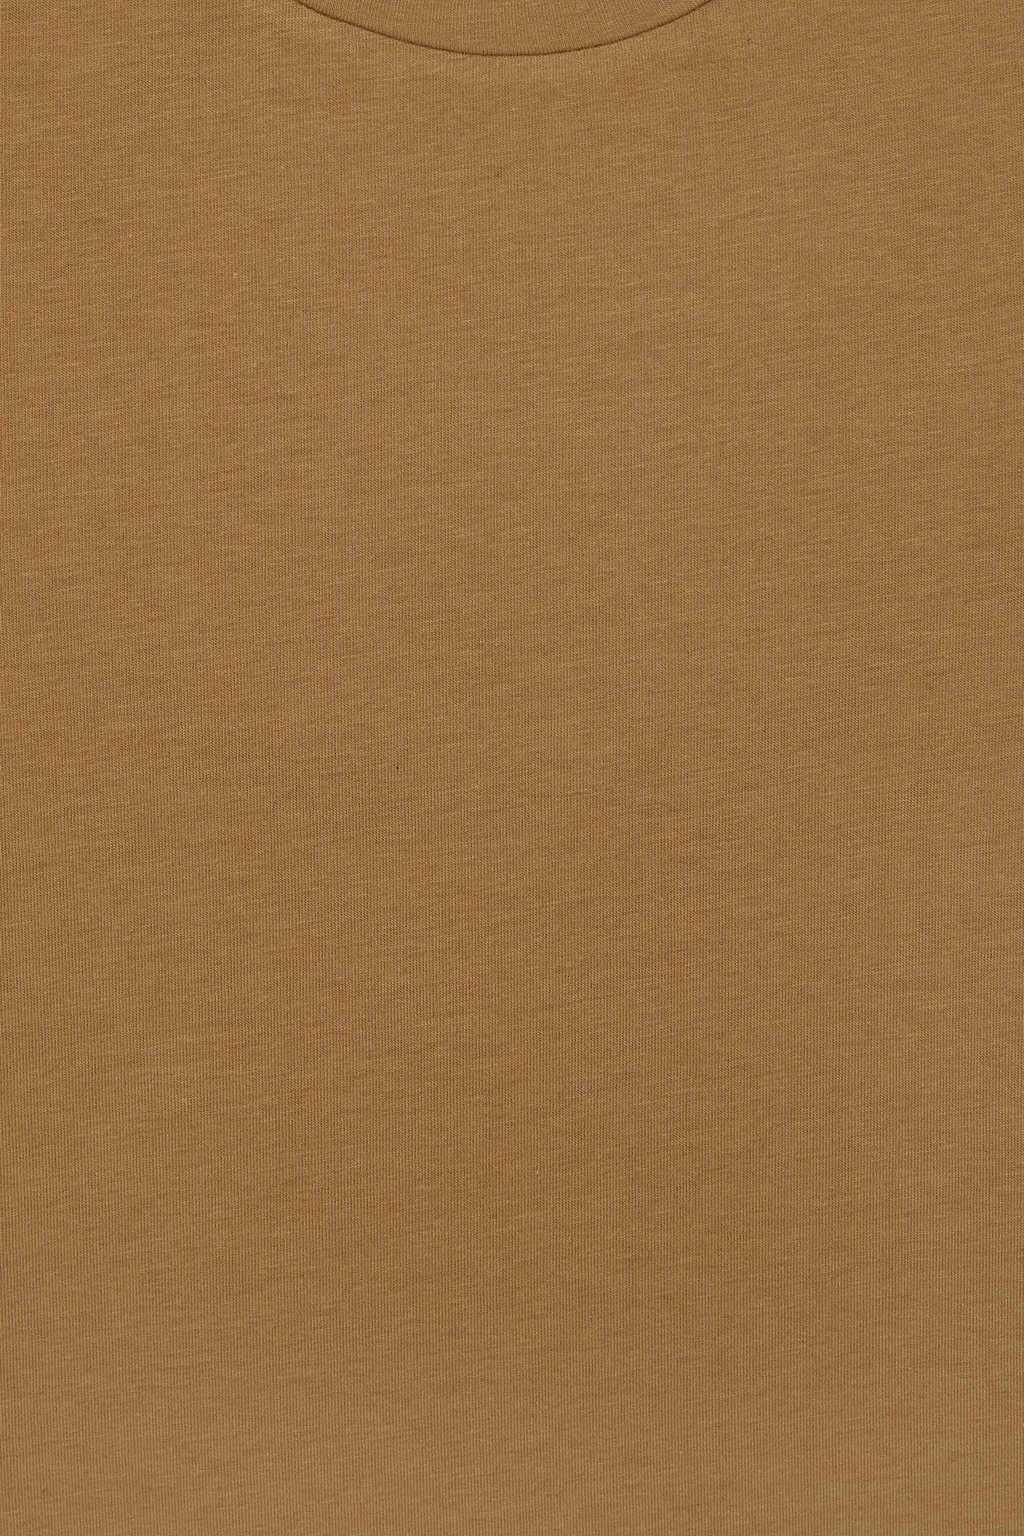 TShirt 3343 Camel 6